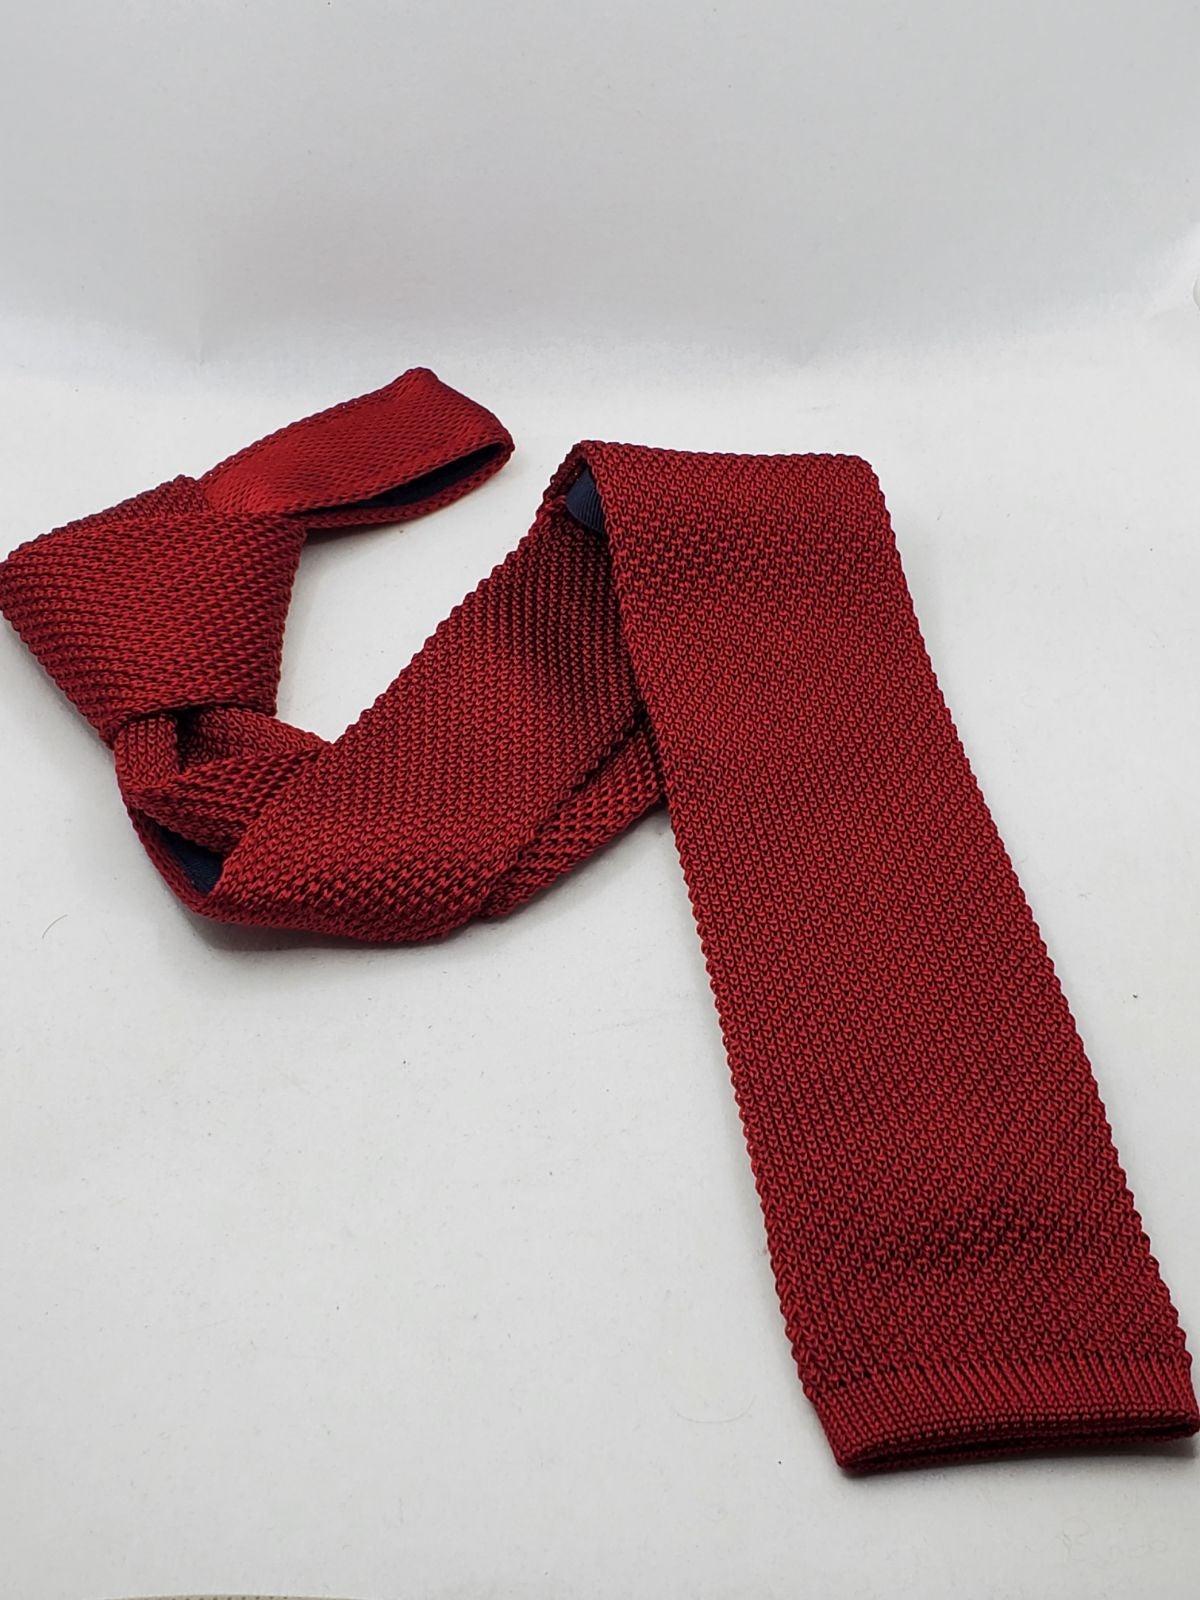 Roundtree & Yorke Men's Silk Knit Tie